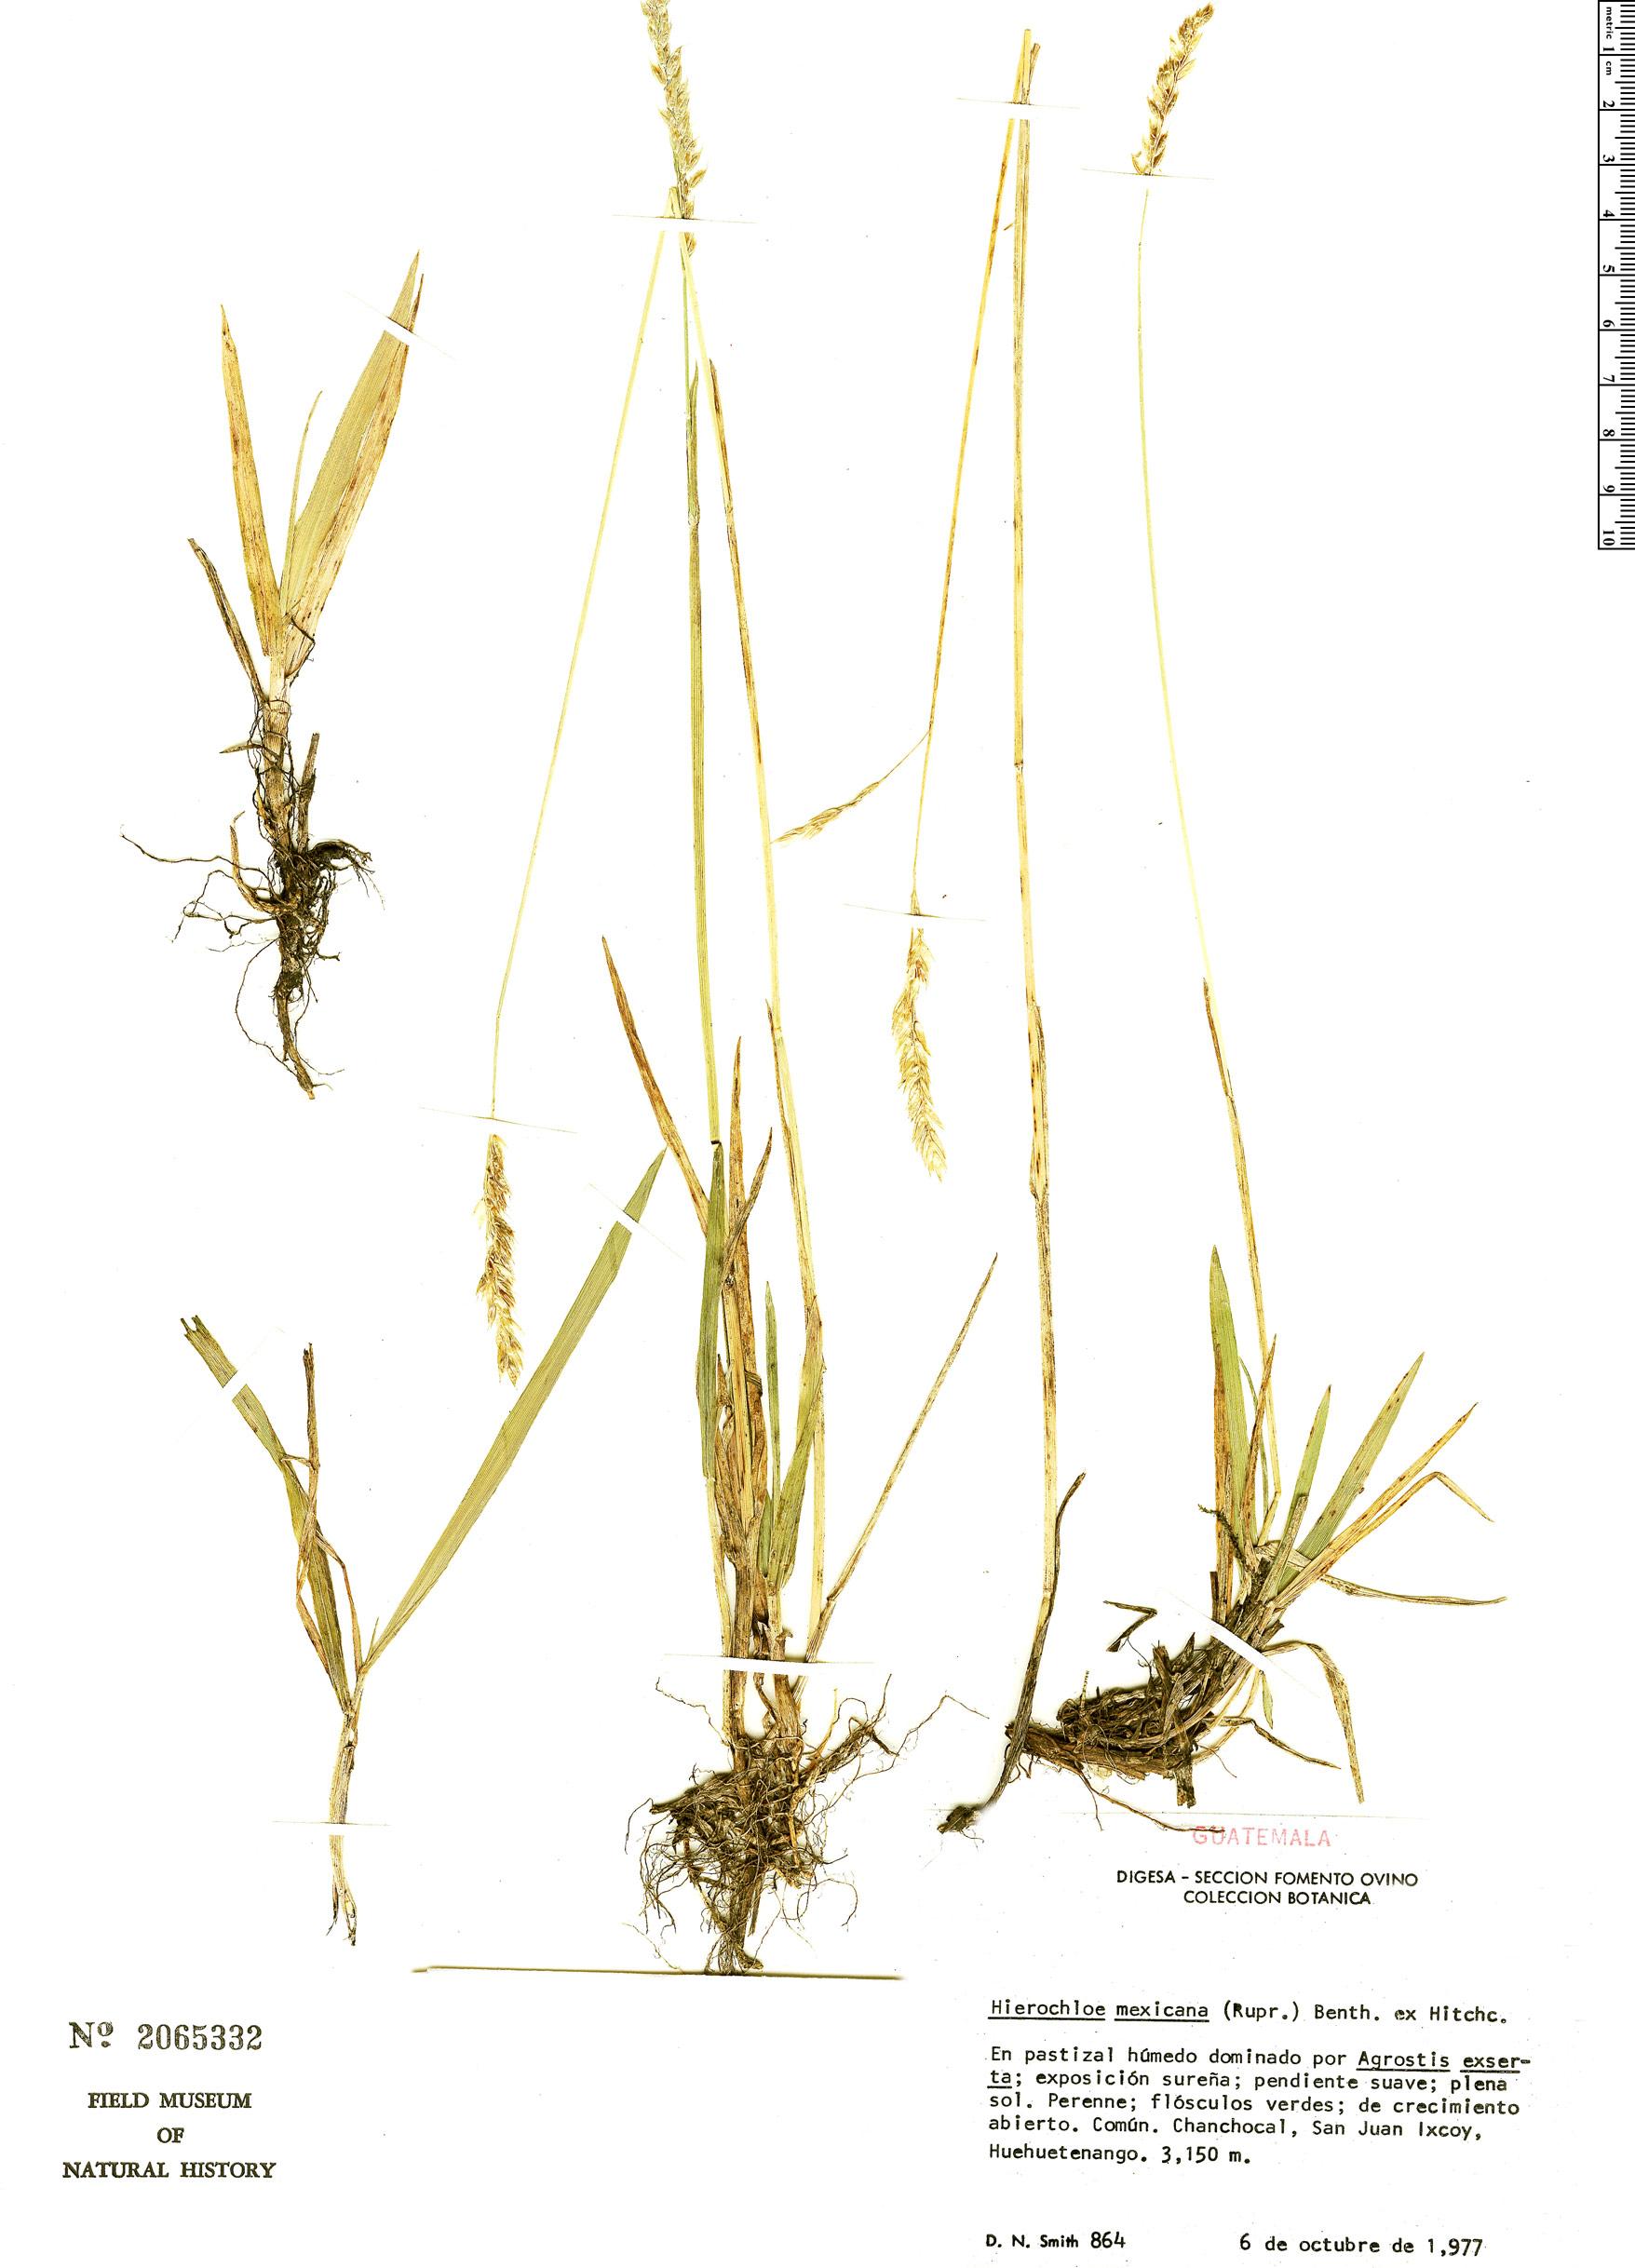 Specimen: Hierochloe mexicana